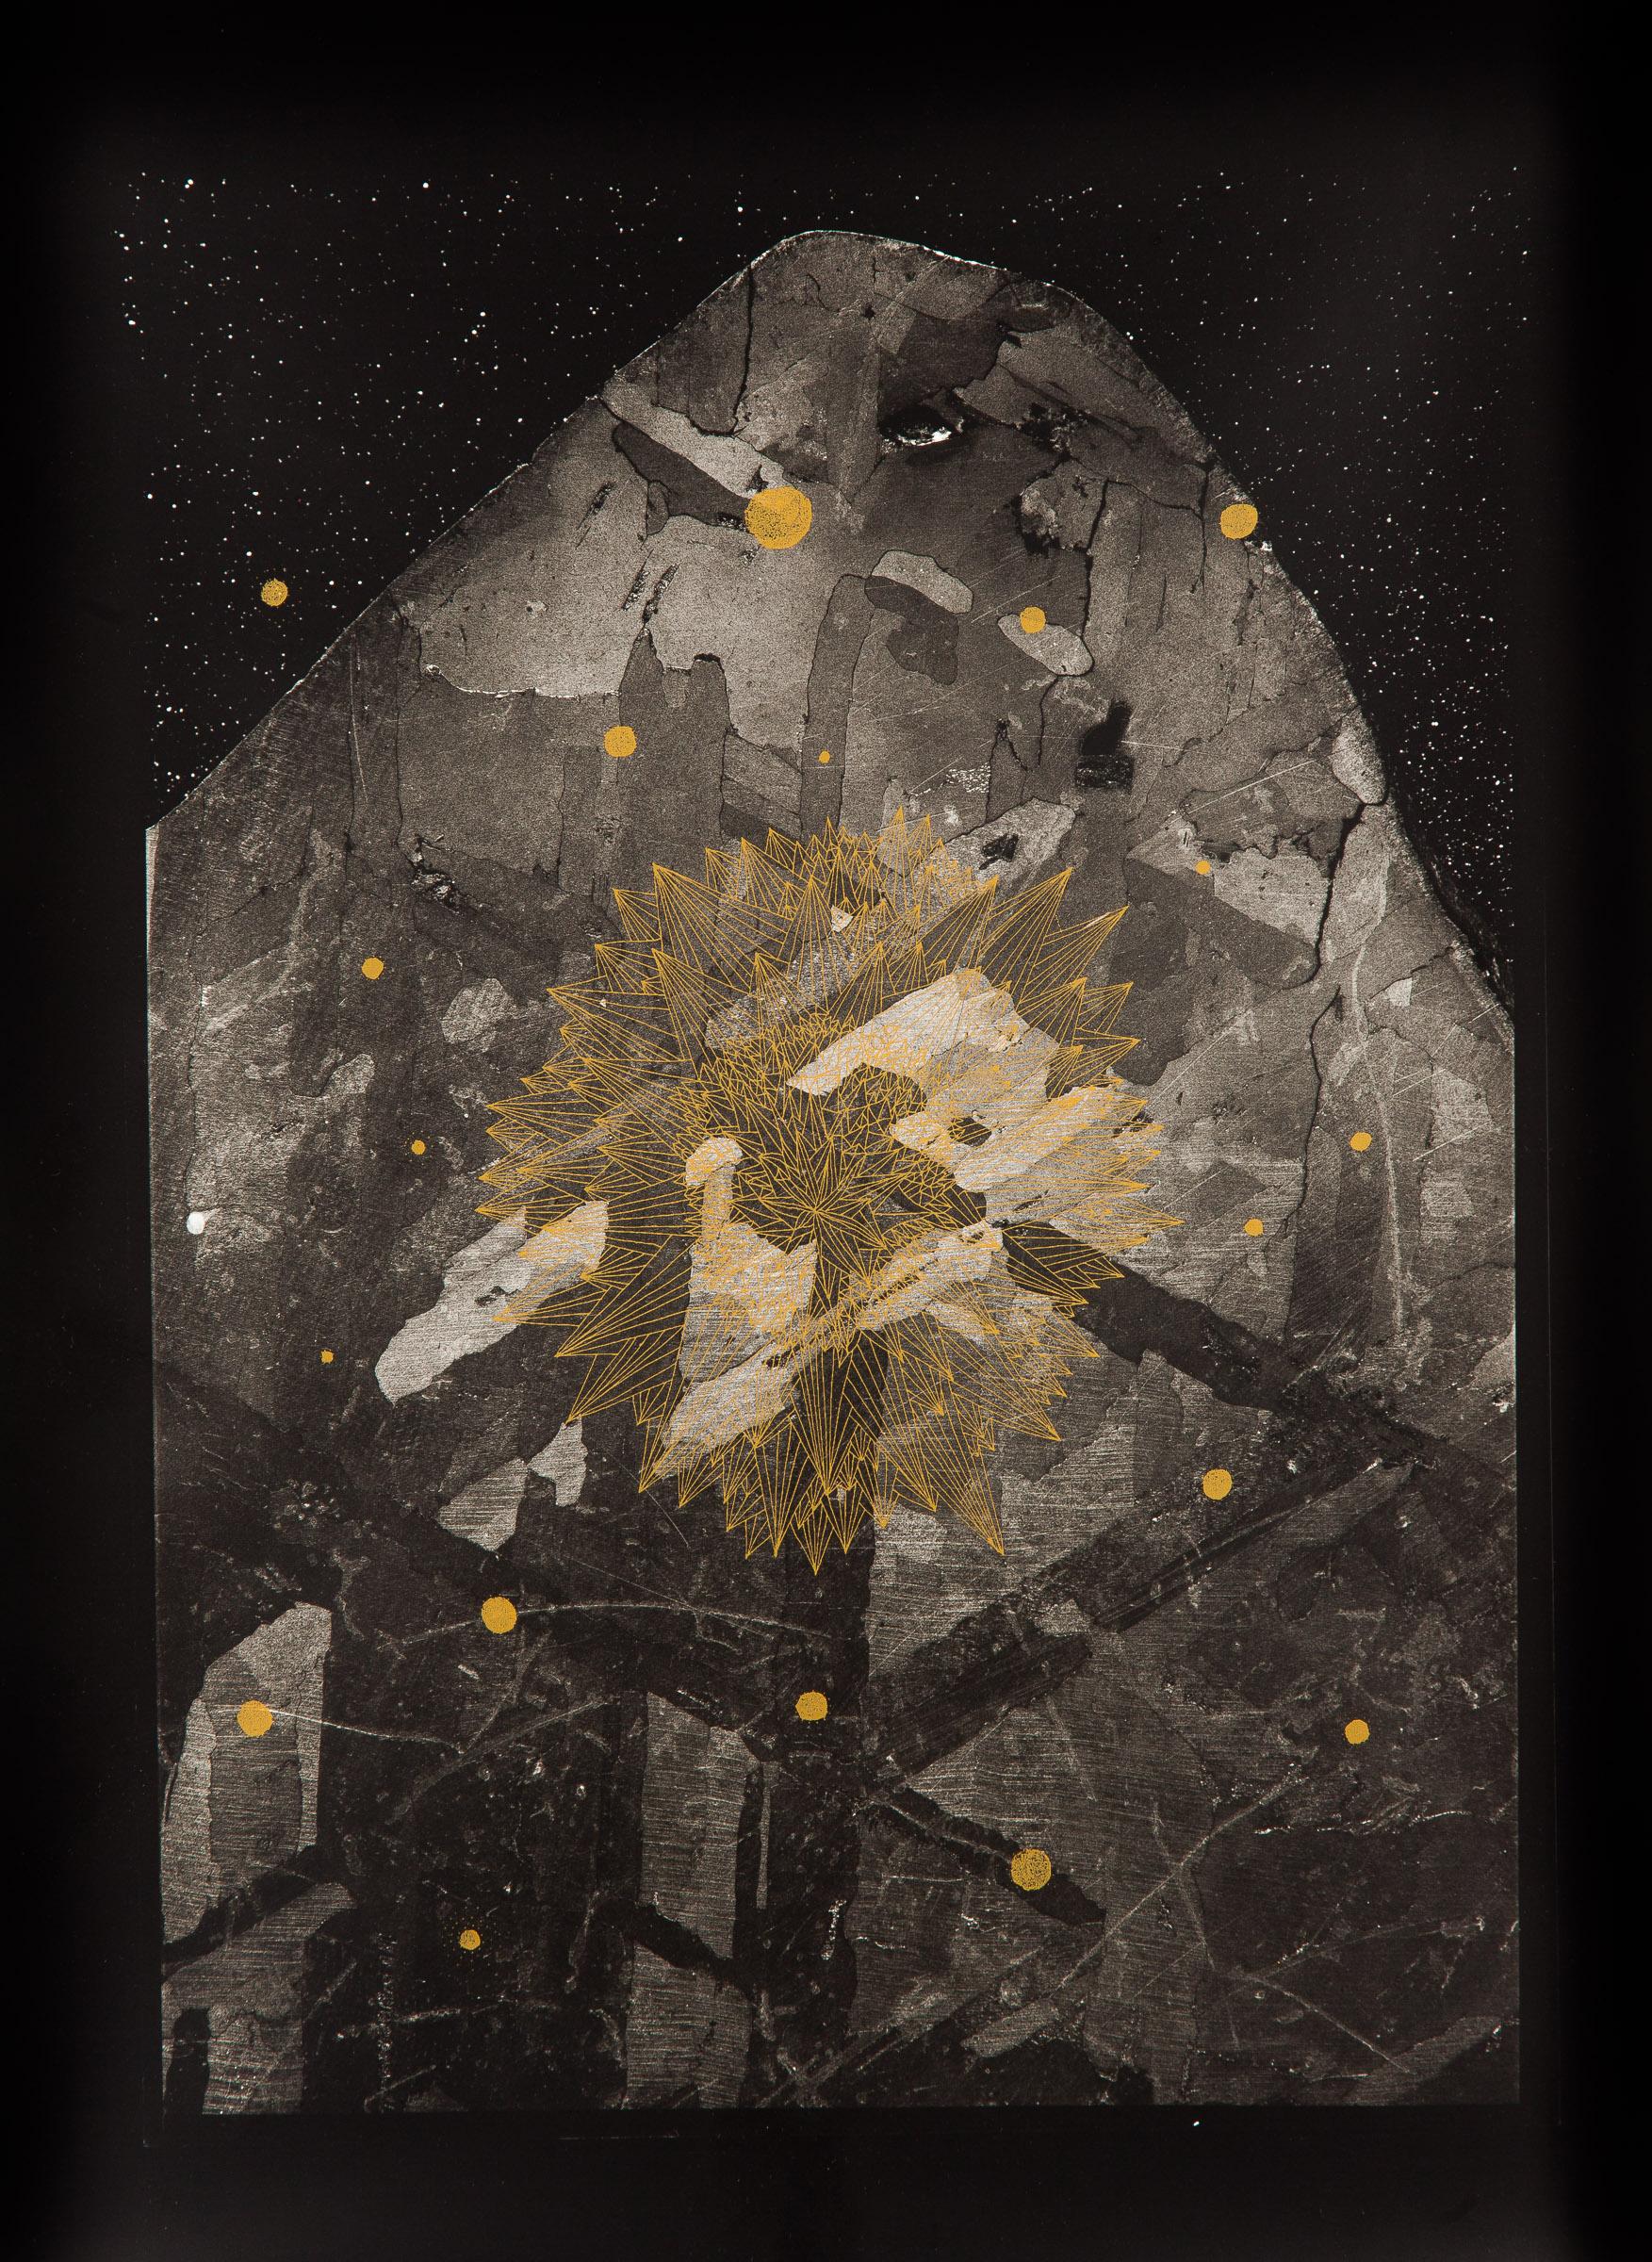 Collision - Meteorites-1.jpg